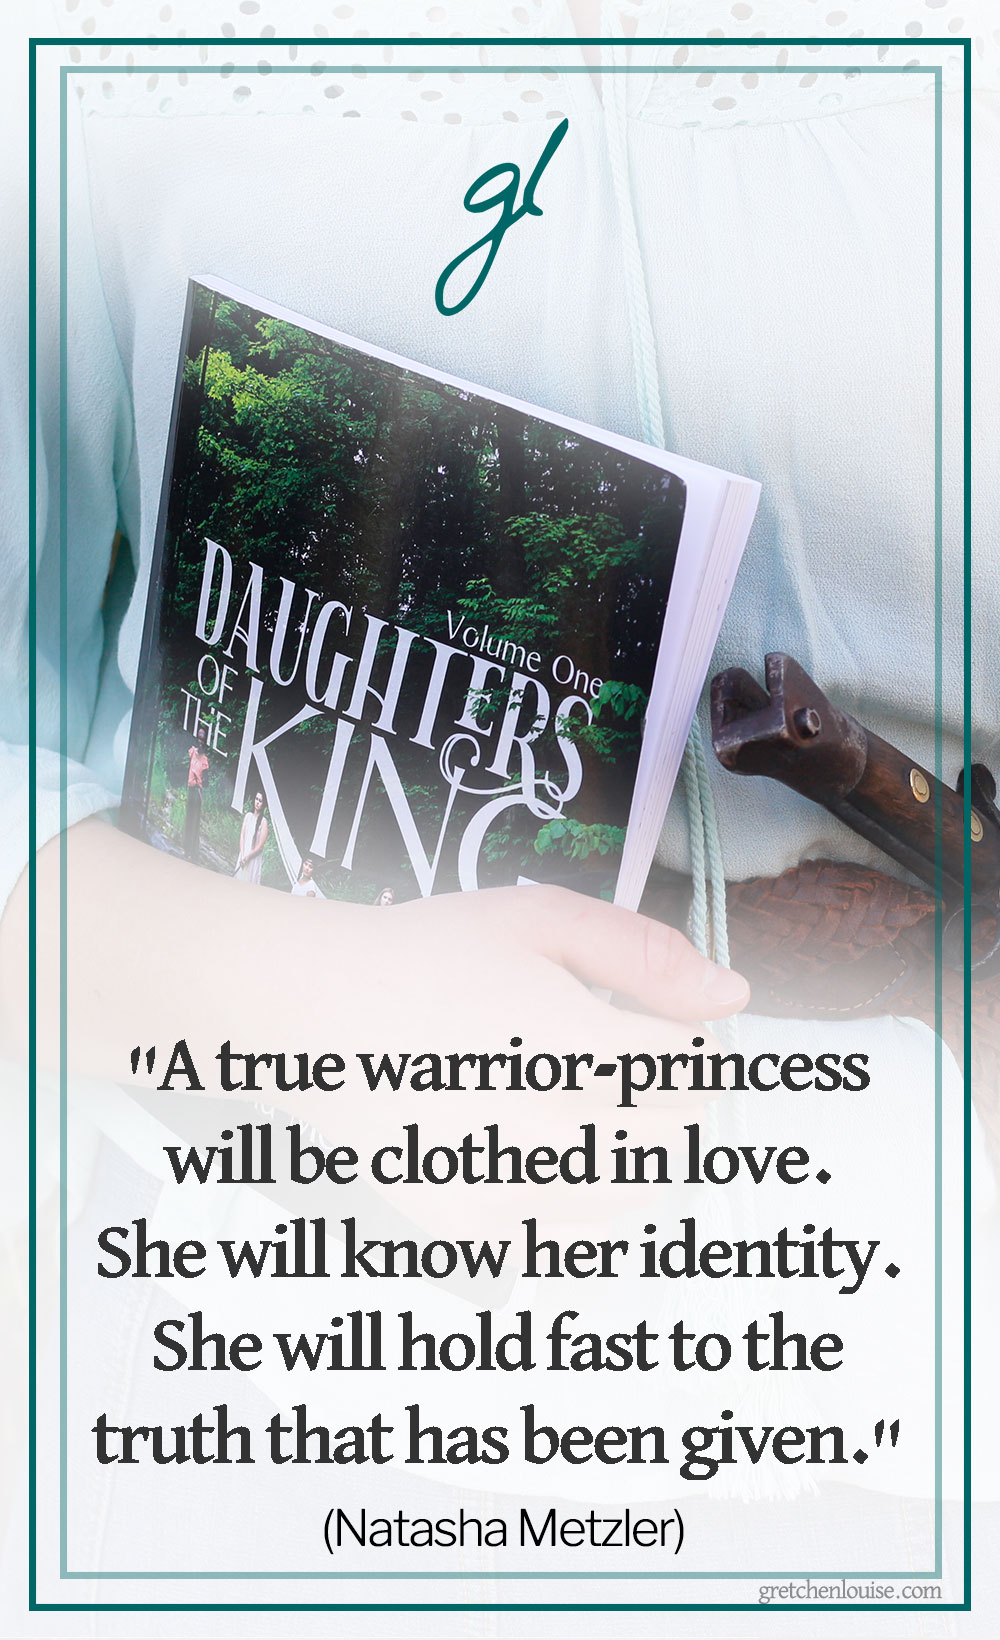 Daughters of the King via @GretLouise